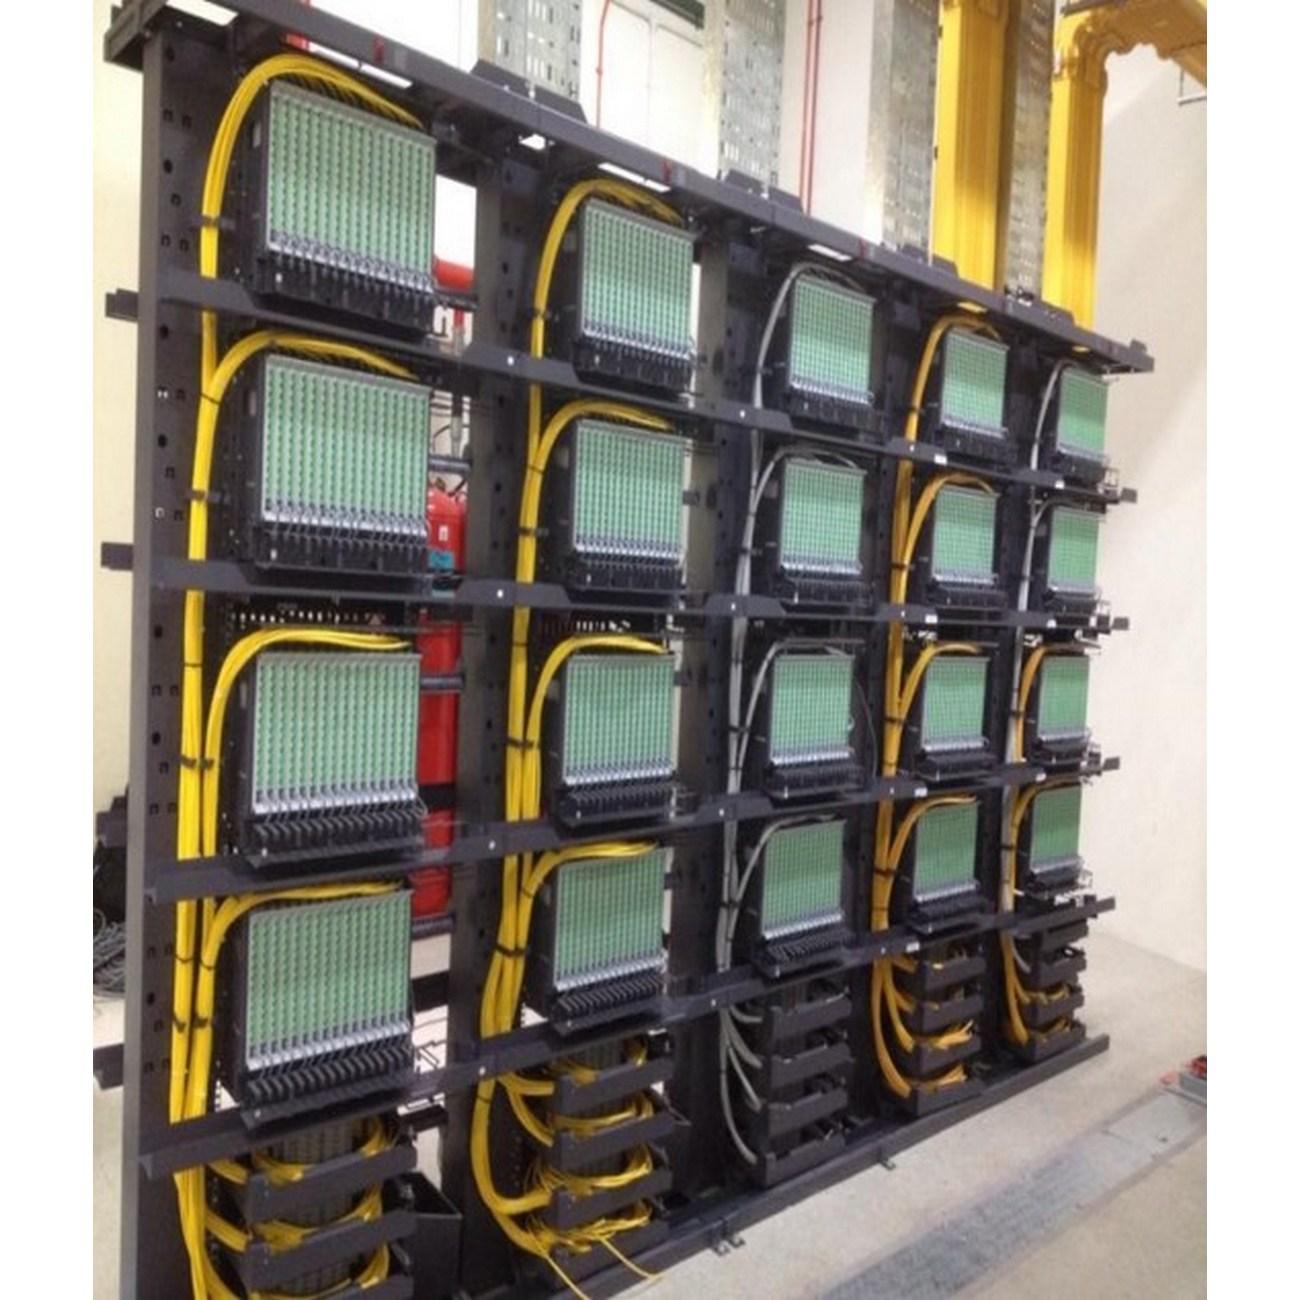 Fiber Optics & Structure Cabling (16)